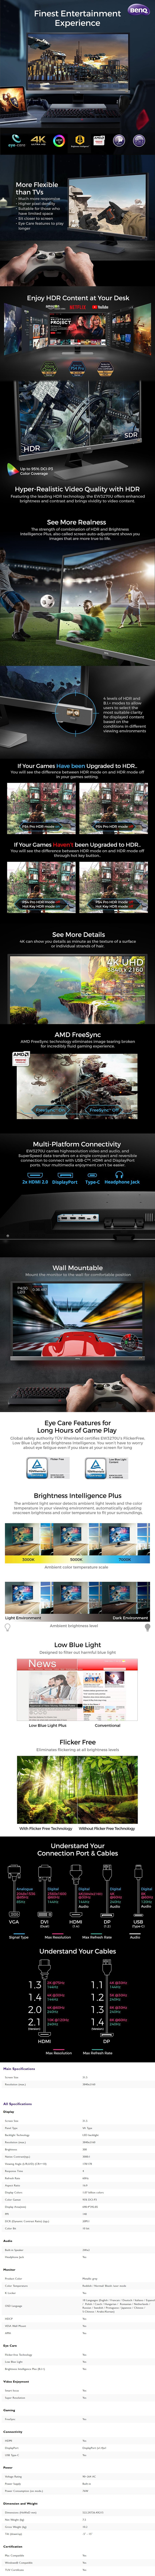 benq-ew3270u-315-4k-uhd-hdr-freesync-va-led-monitor-ac14625-11.jpg